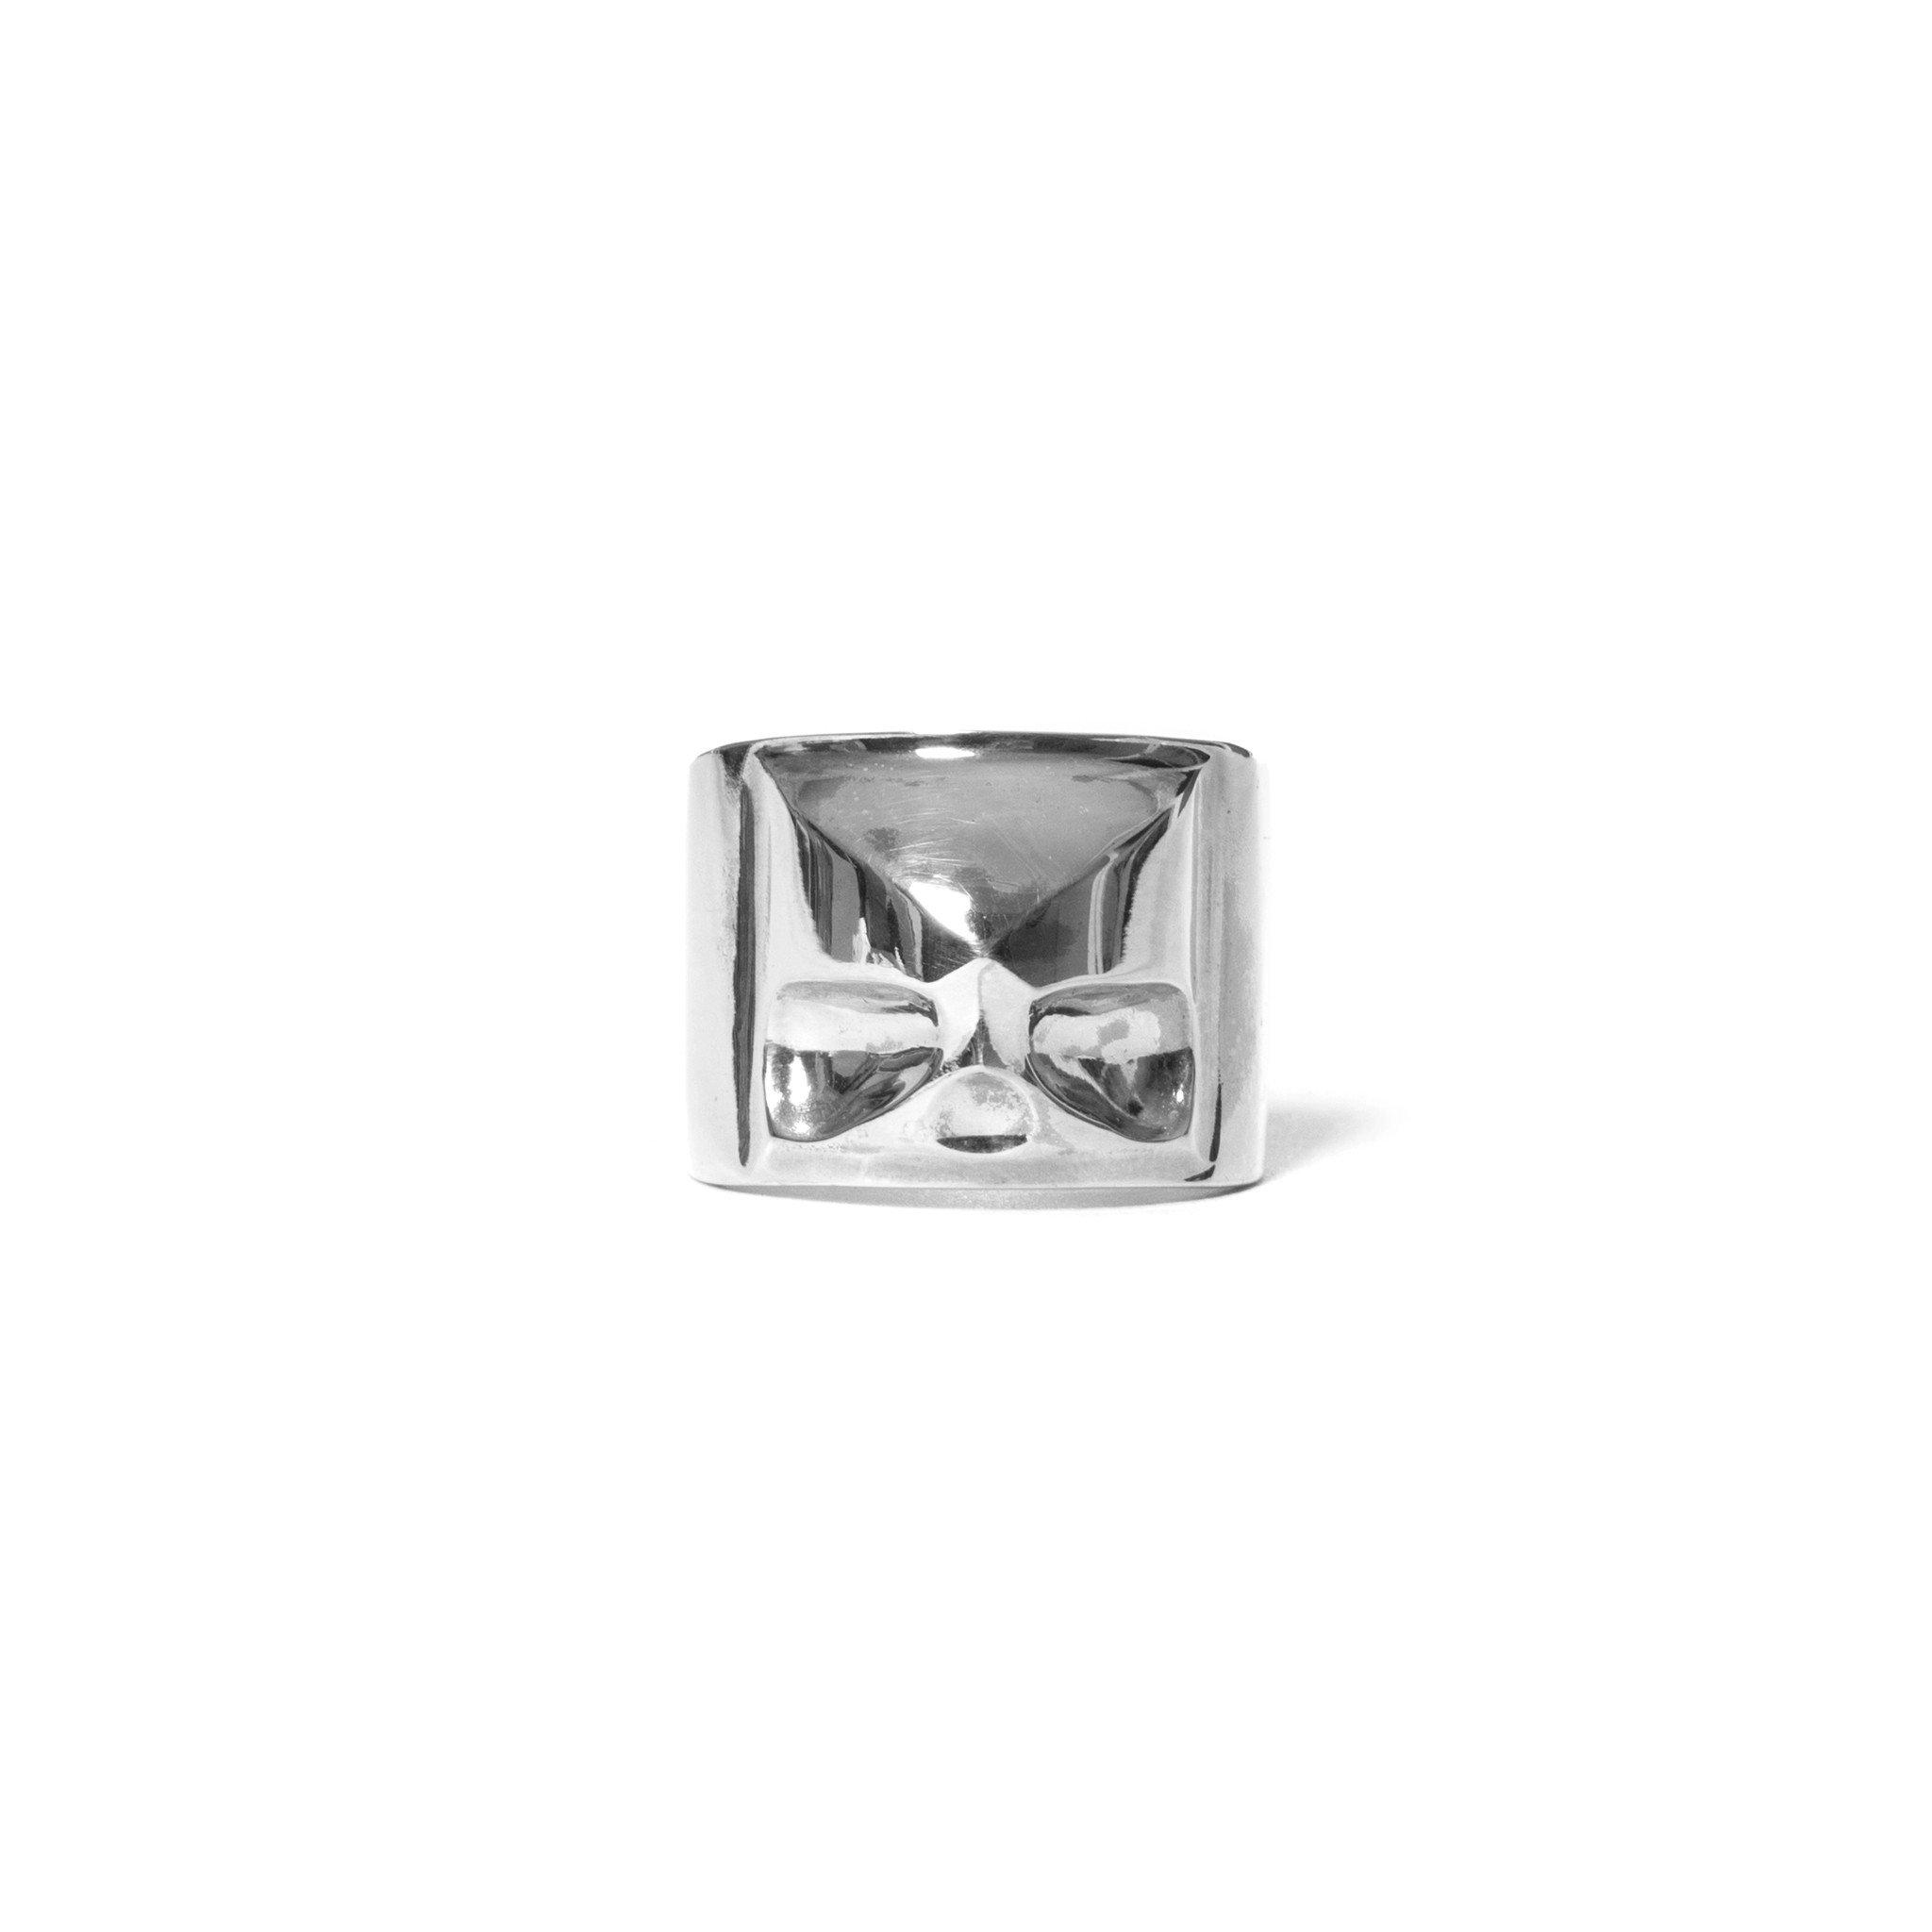 Takahiro-Miyashita-The-Soloist-Skull-Ring-Silver-1 2048x2048